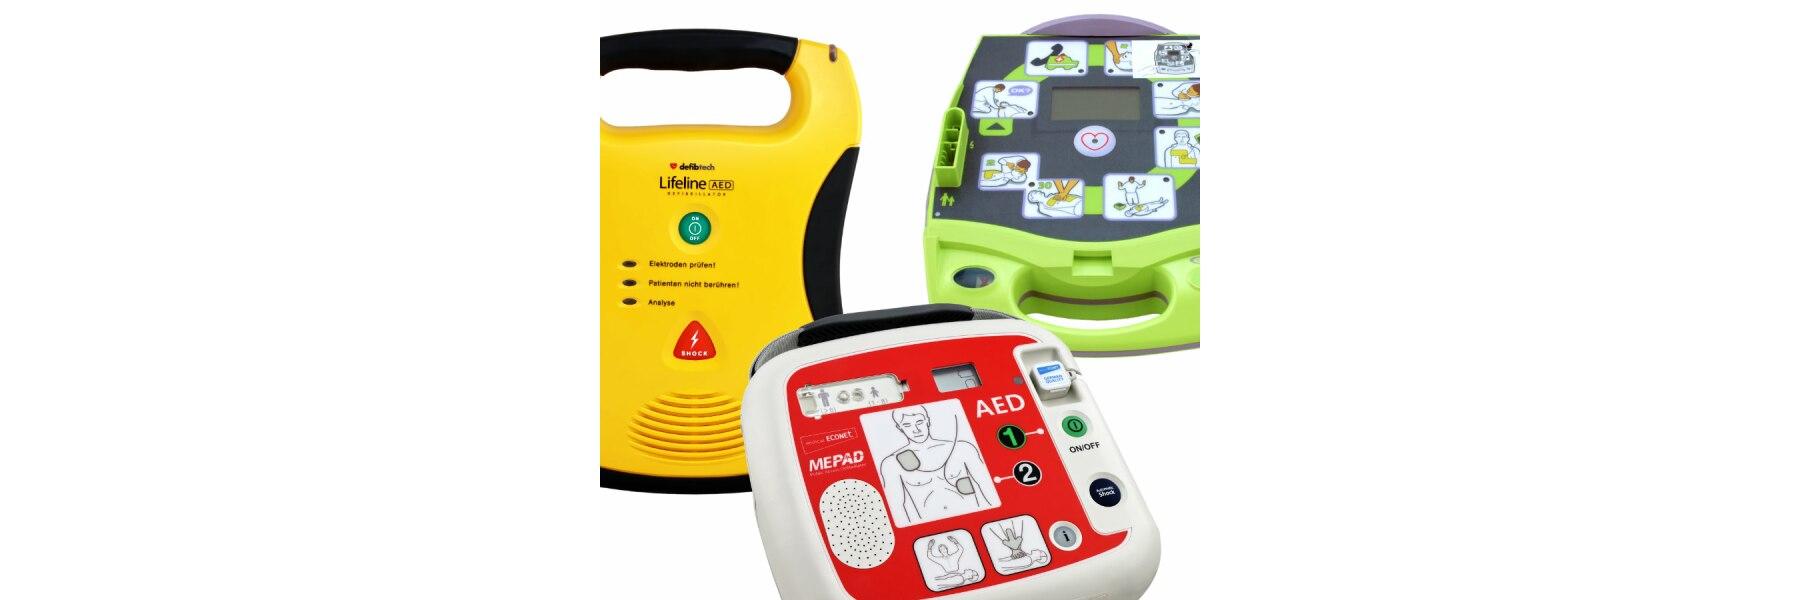 AED Defibrillatoren